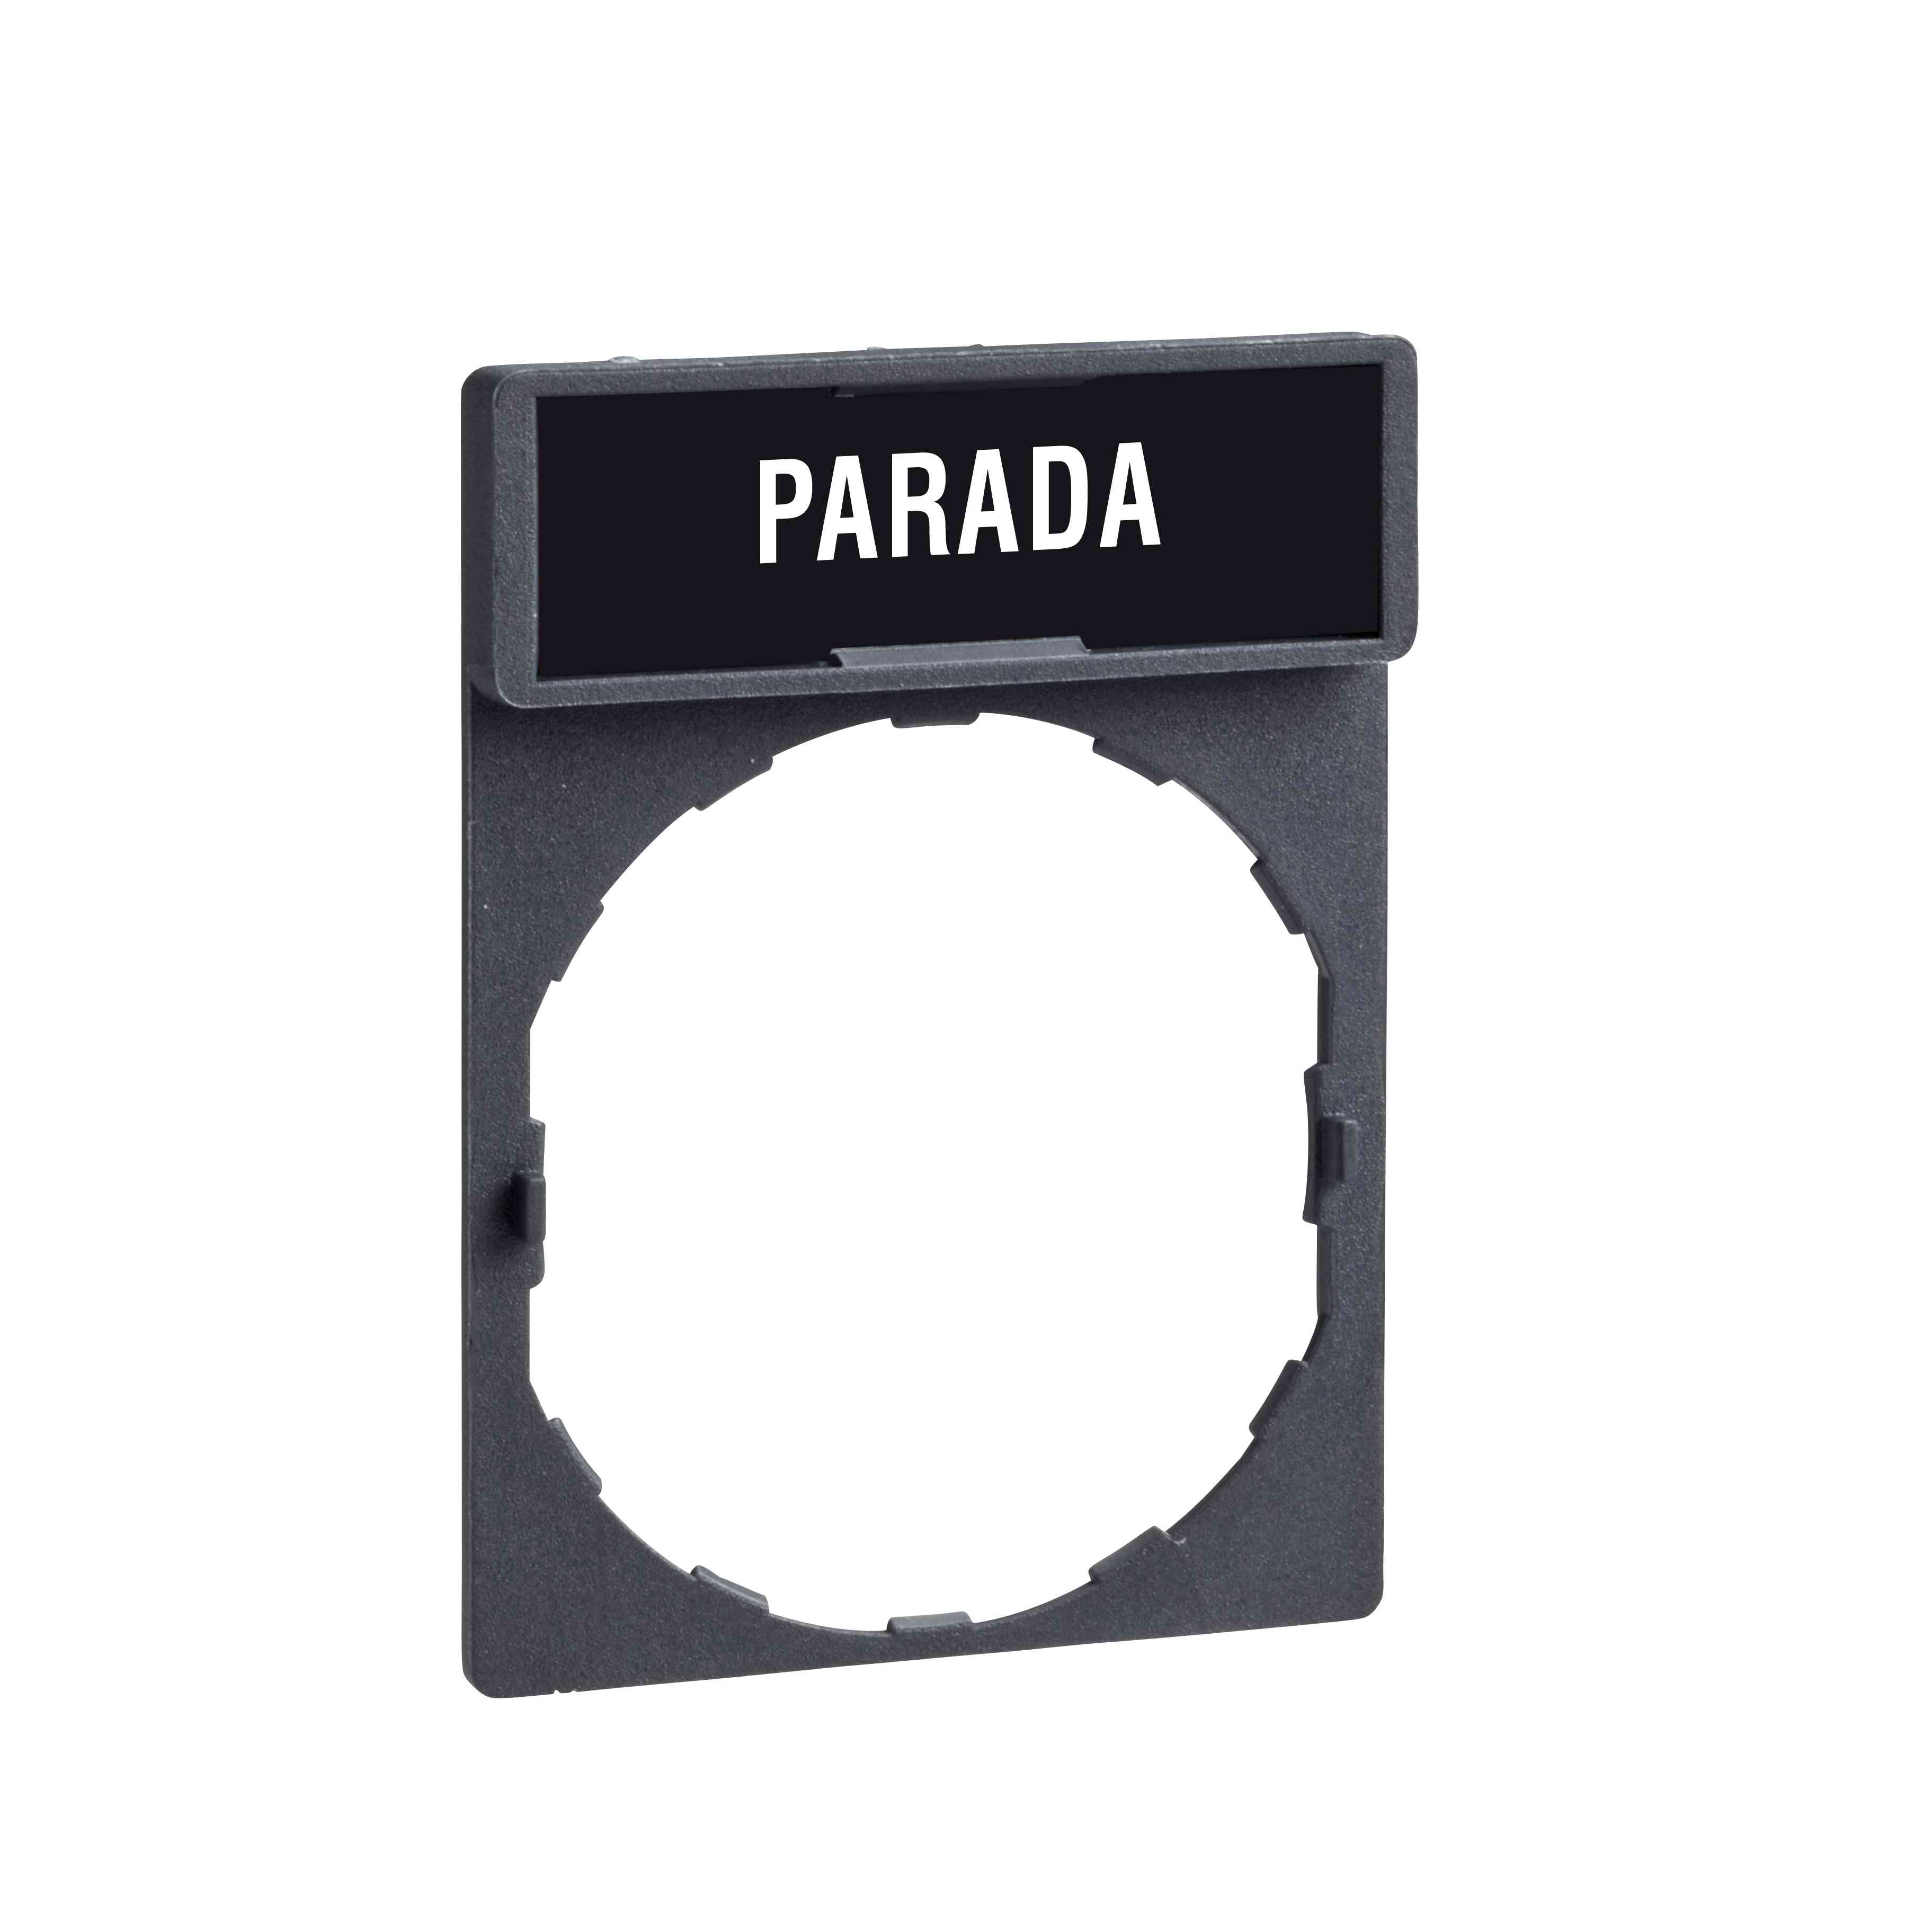 Nosilec legende 30 x 40 mm z legendo 8 x 27 mm z oznako PARADA